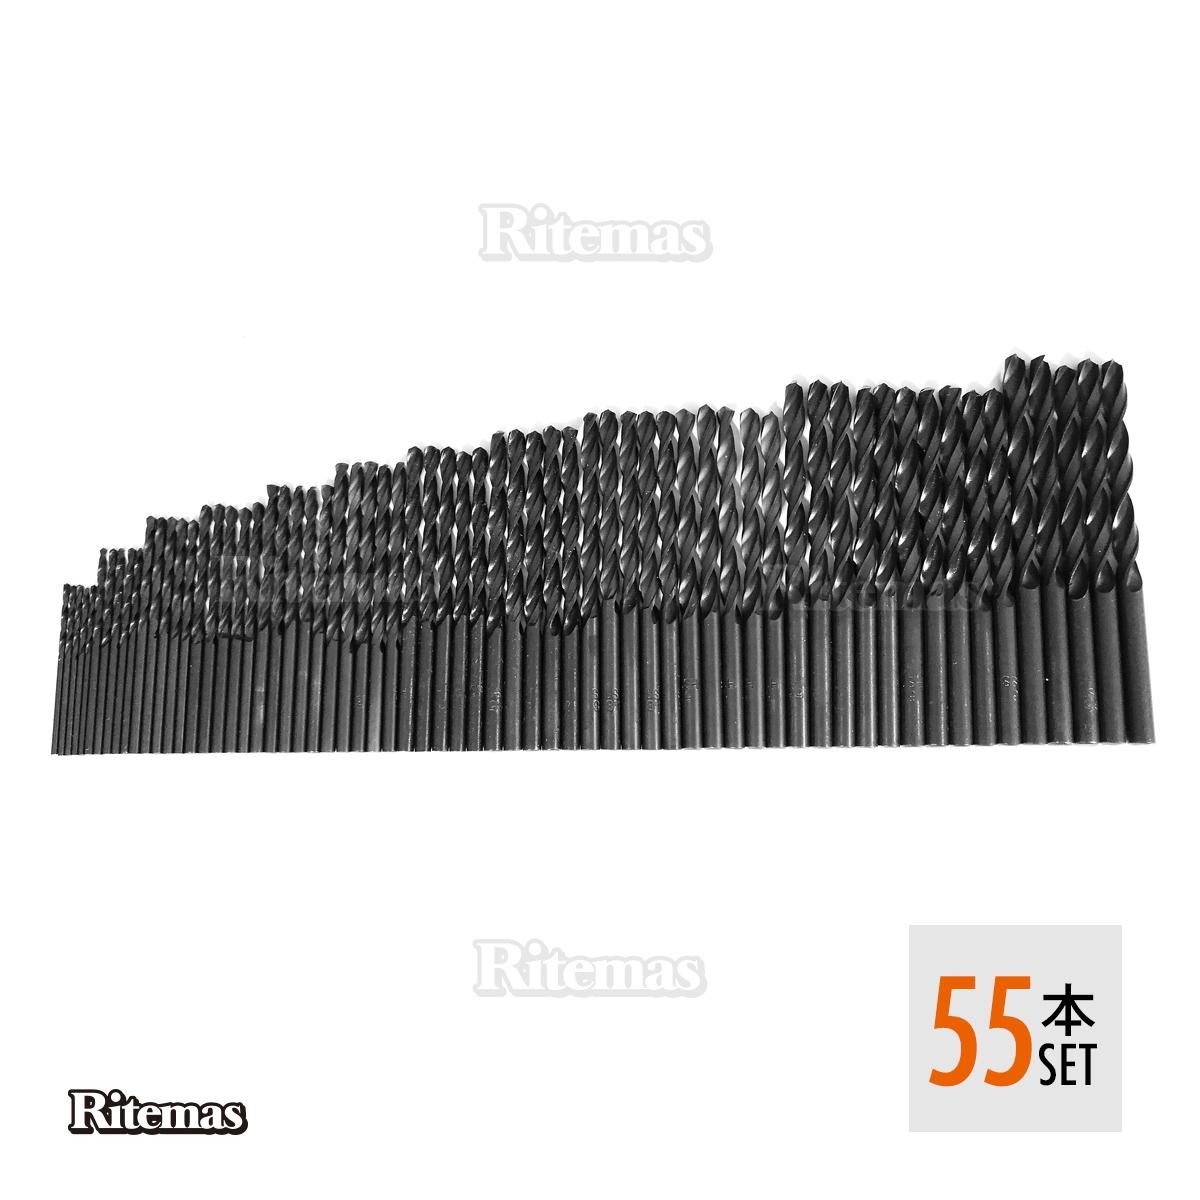 HSS 鉄鋼用 1.5mm~6.5mm 55本セット ドリル刃 ドリル キリ ツイスト スーパーセール セット 各5本 DIY 11サイズ 55本 鉄工用ドリル 輸入 大容量